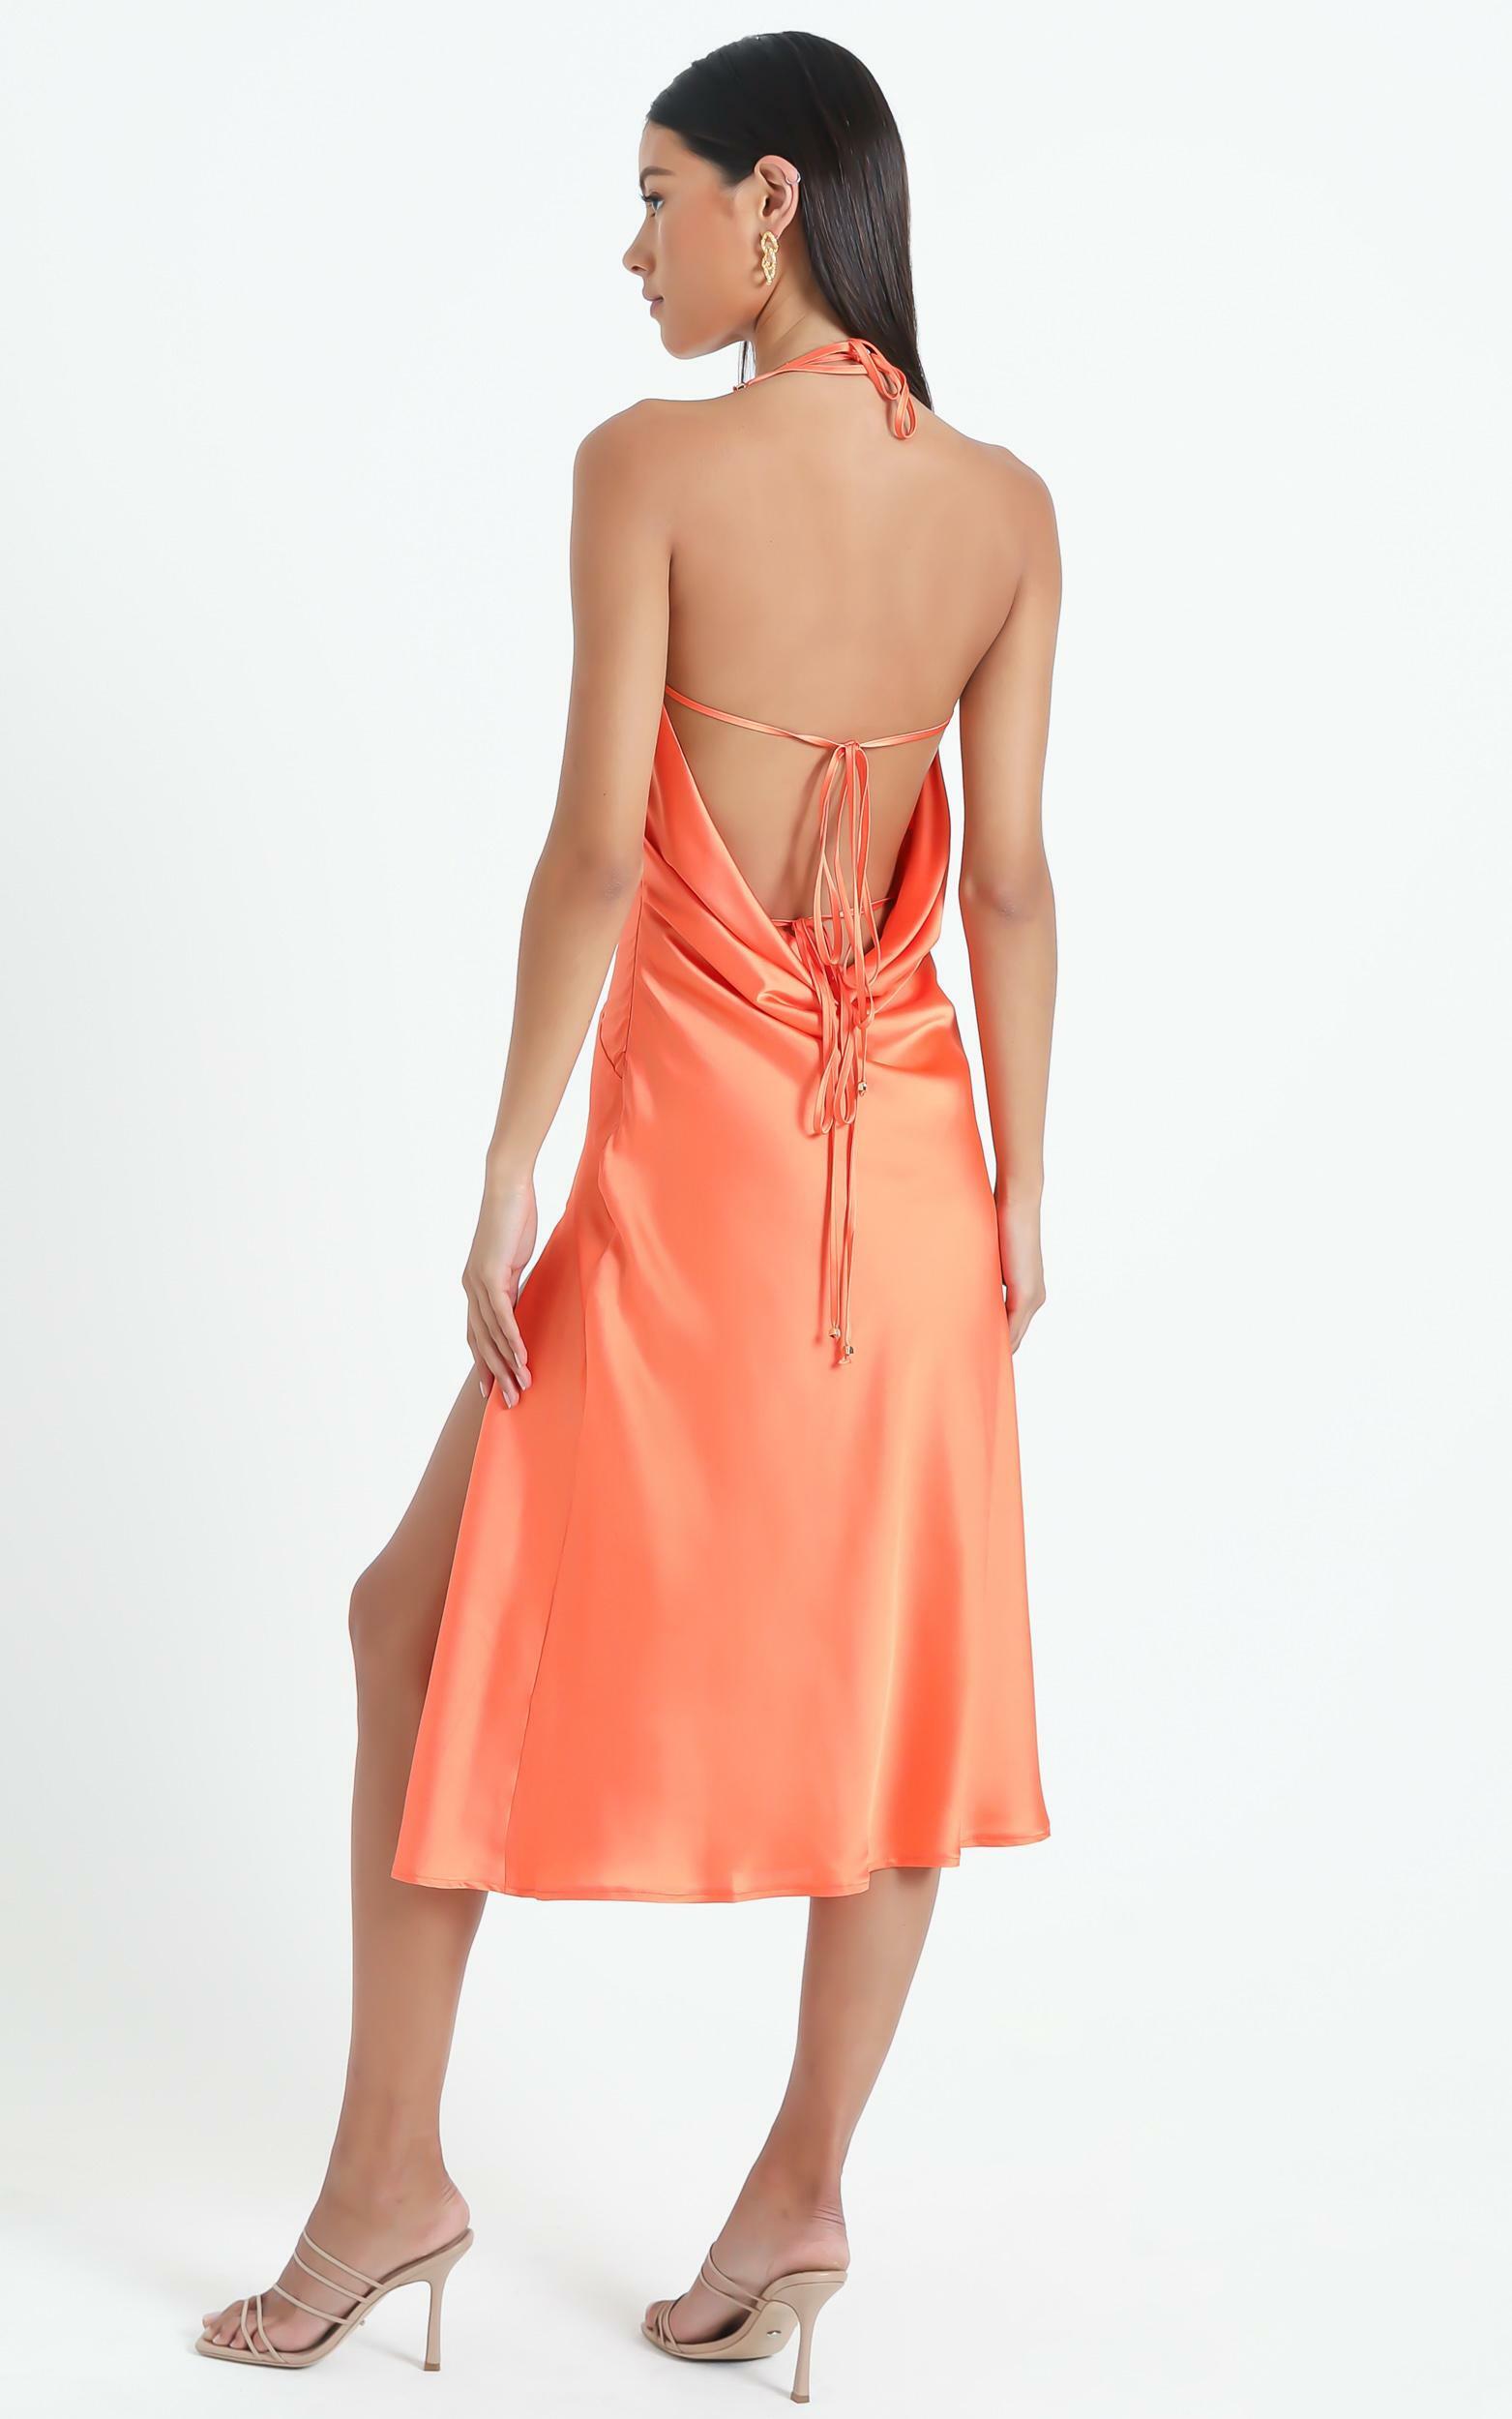 Florentina Dress in Orange Satin - 06, ORG2, hi-res image number null